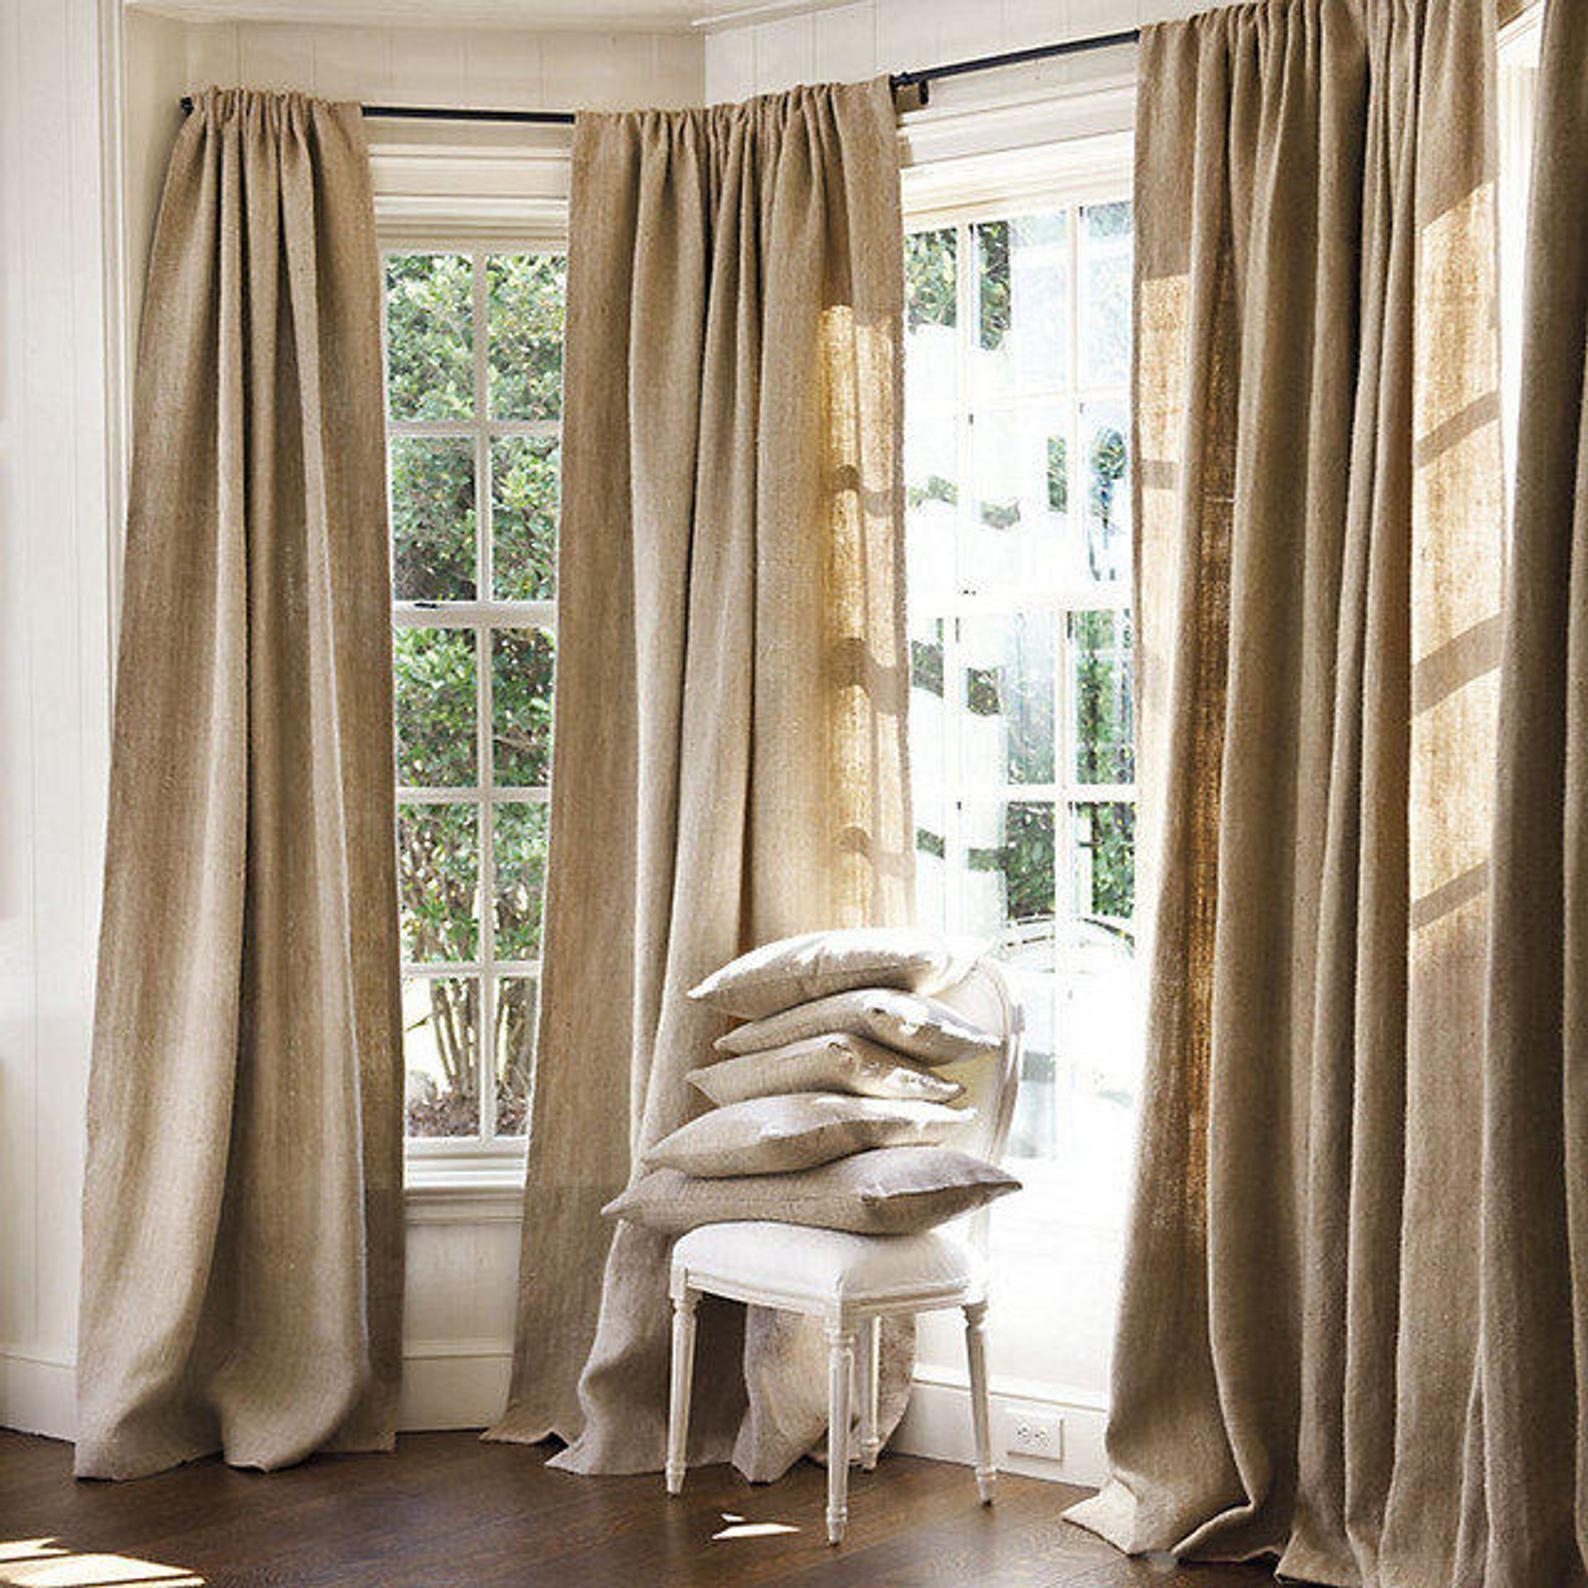 Burlap Curtains, , Natural Burlap curtains Window Treatments, Curtains, living room decor,burlap #burlapwindowtreatments